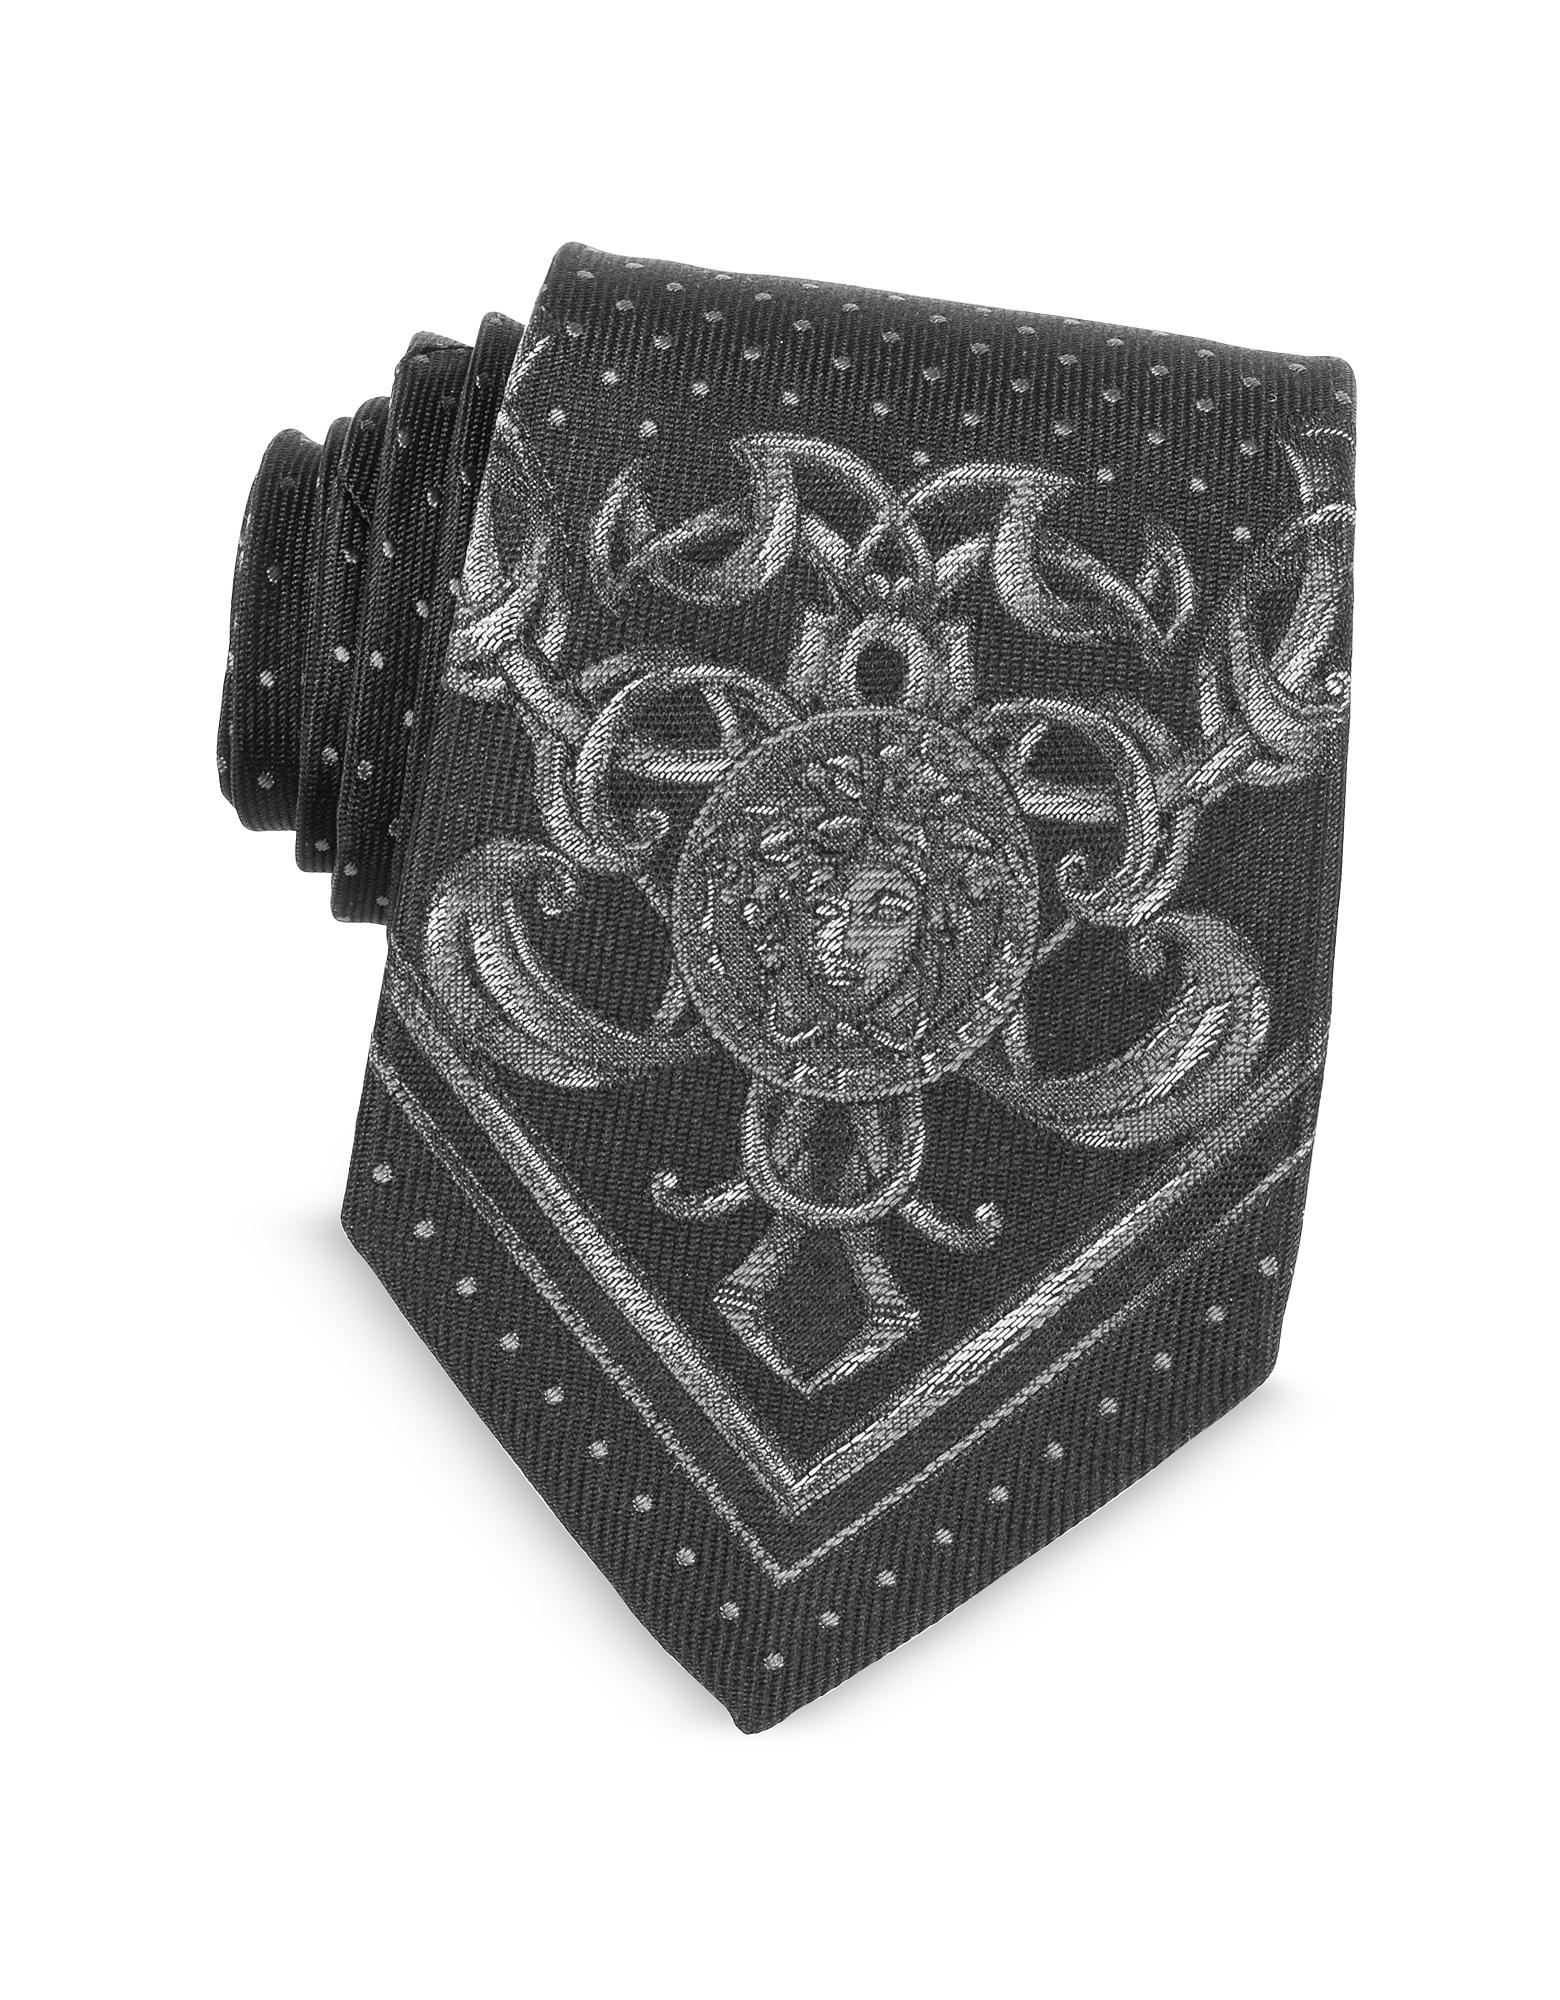 Versace Ties, Micro Polka Dots Narrow Ties w/Medusa Print